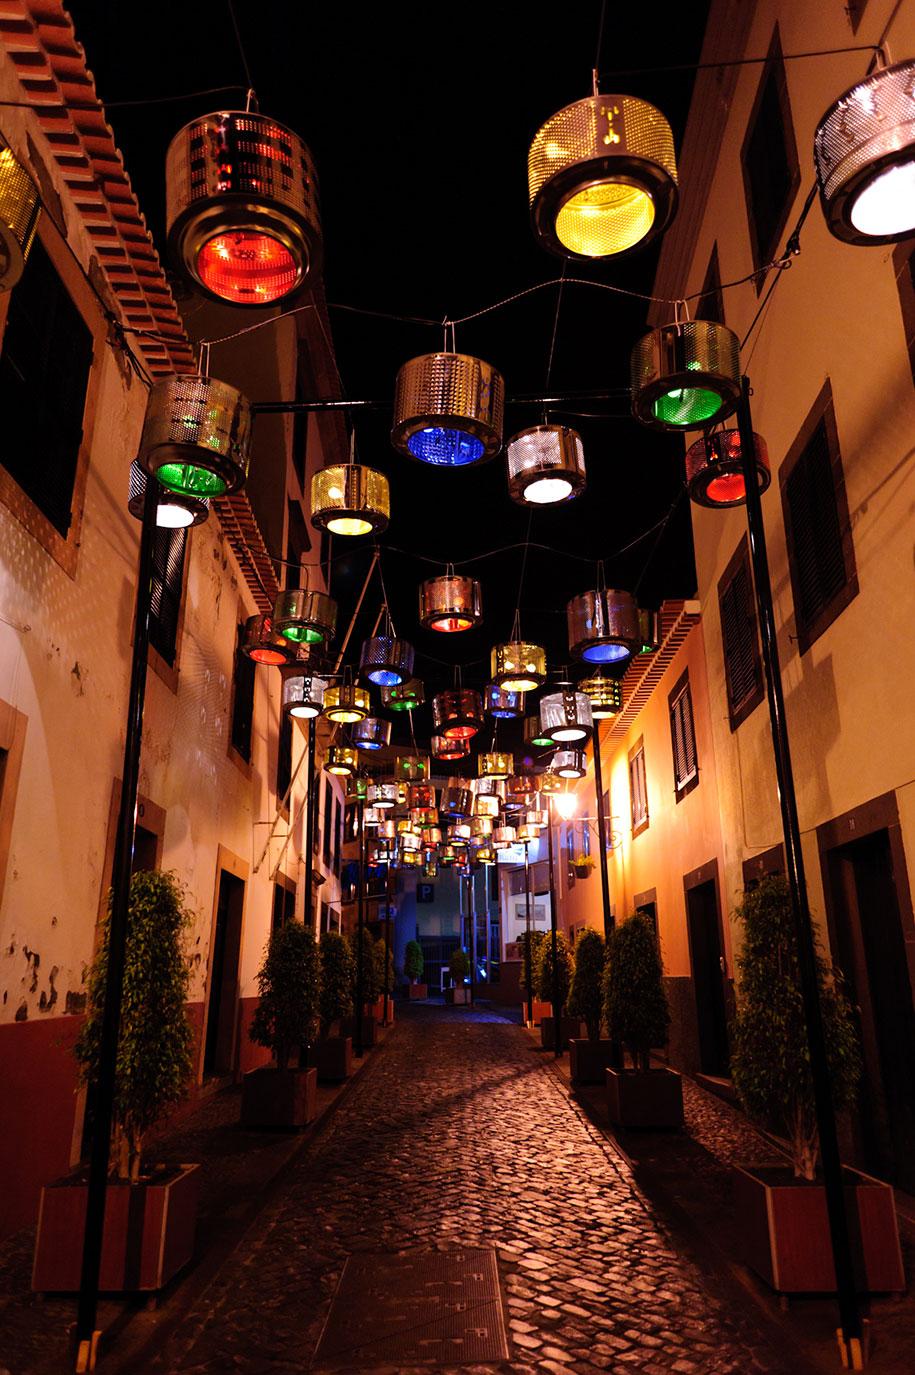 washing-machine-drum-lamps-teatro-metaphora-portugal-1